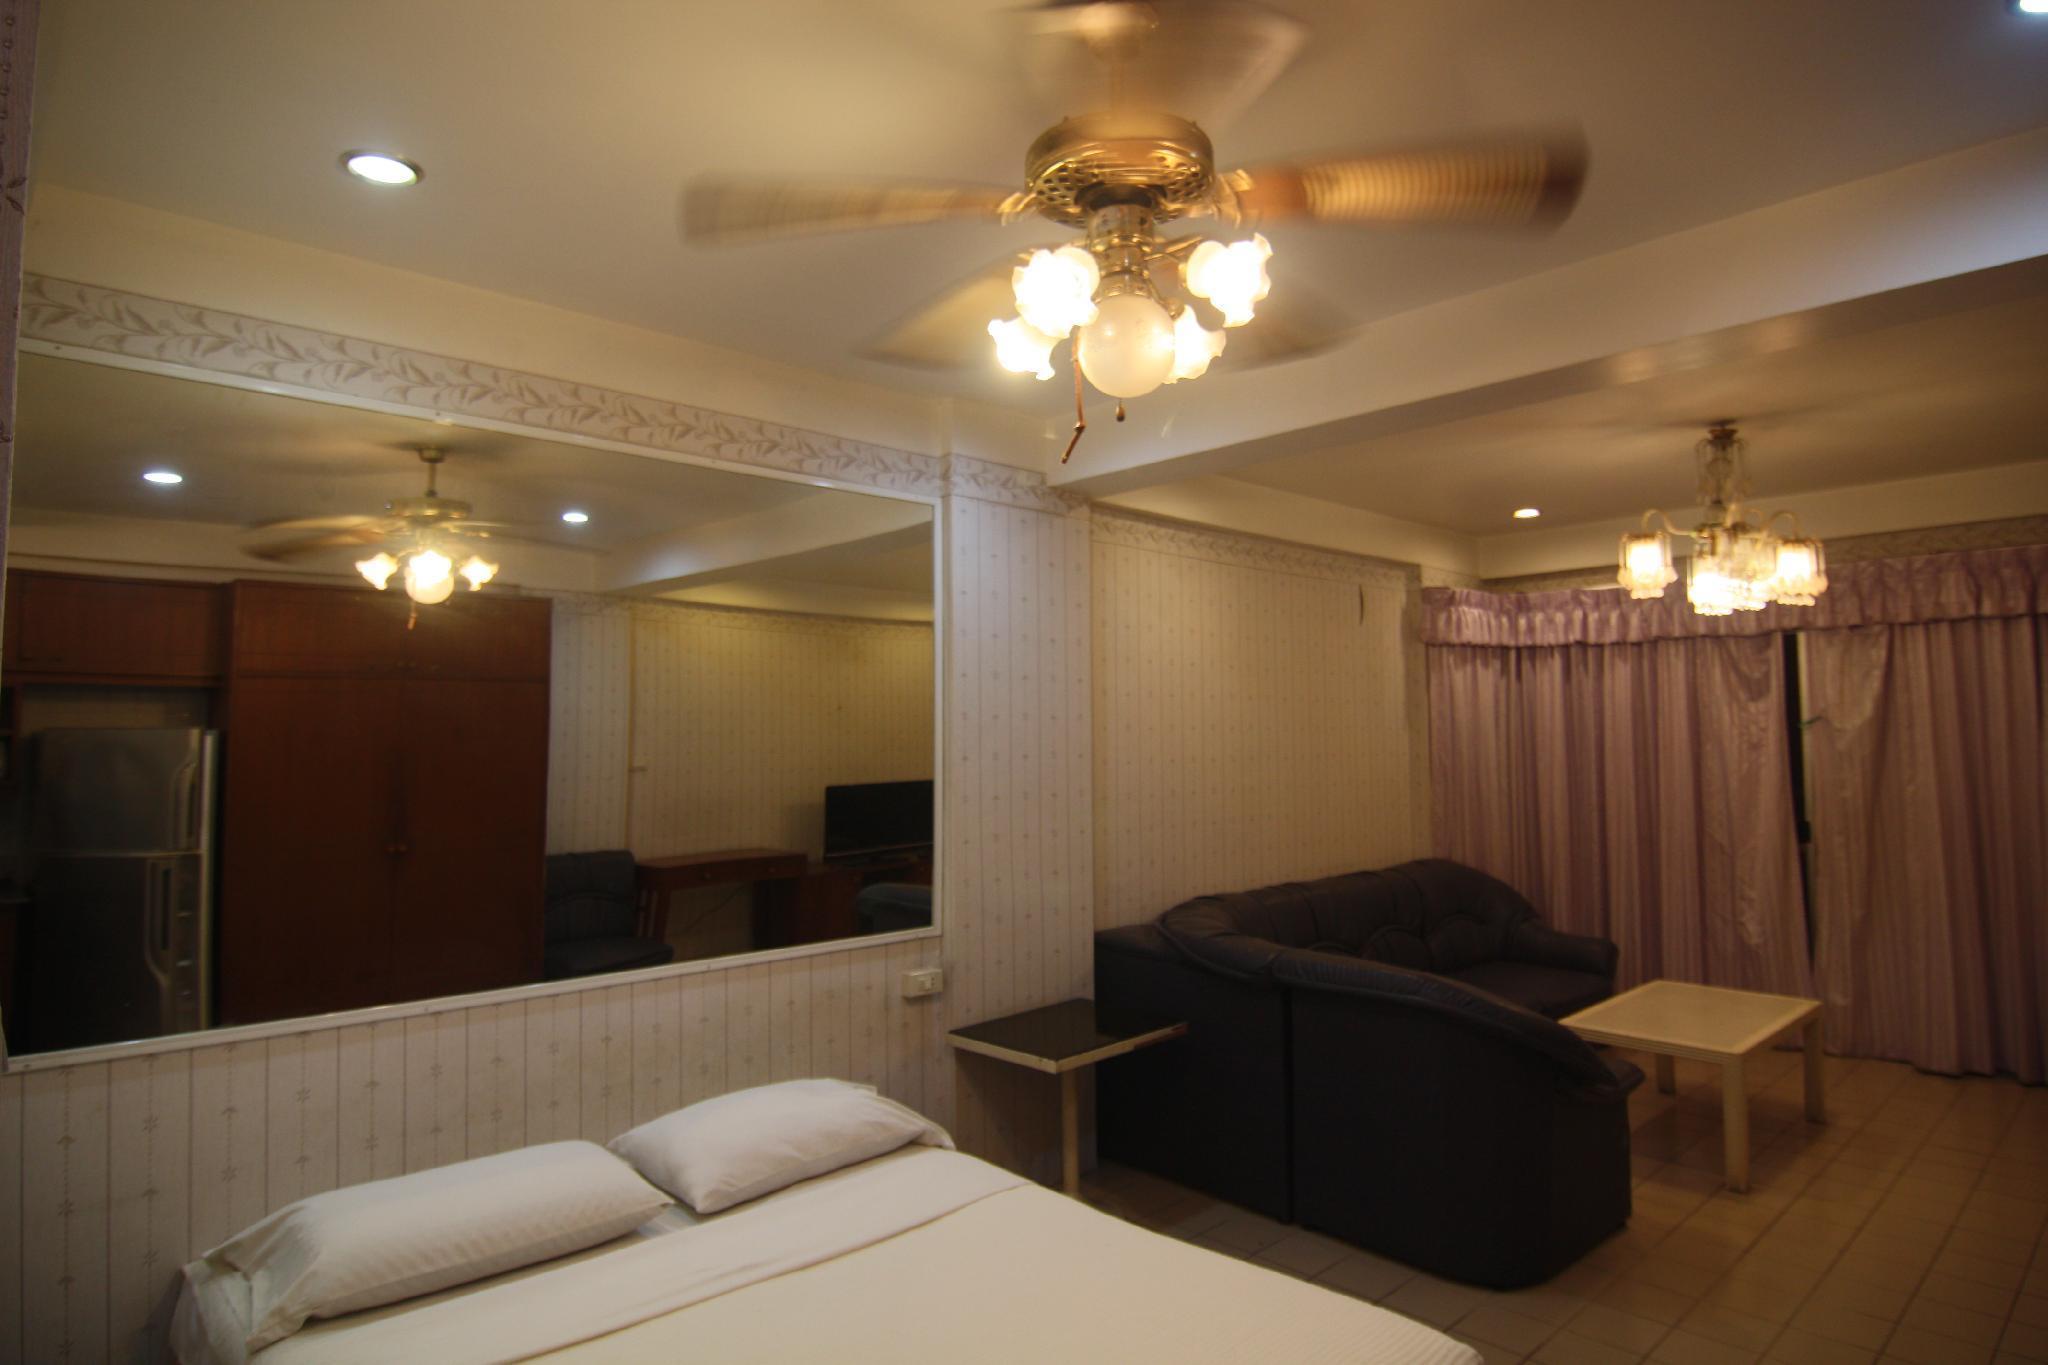 R704 Pattaya tower สตูดิโอ อพาร์ตเมนต์ 1 ห้องน้ำส่วนตัว ขนาด 40 ตร.ม. – ถนนเลียบชายหาด